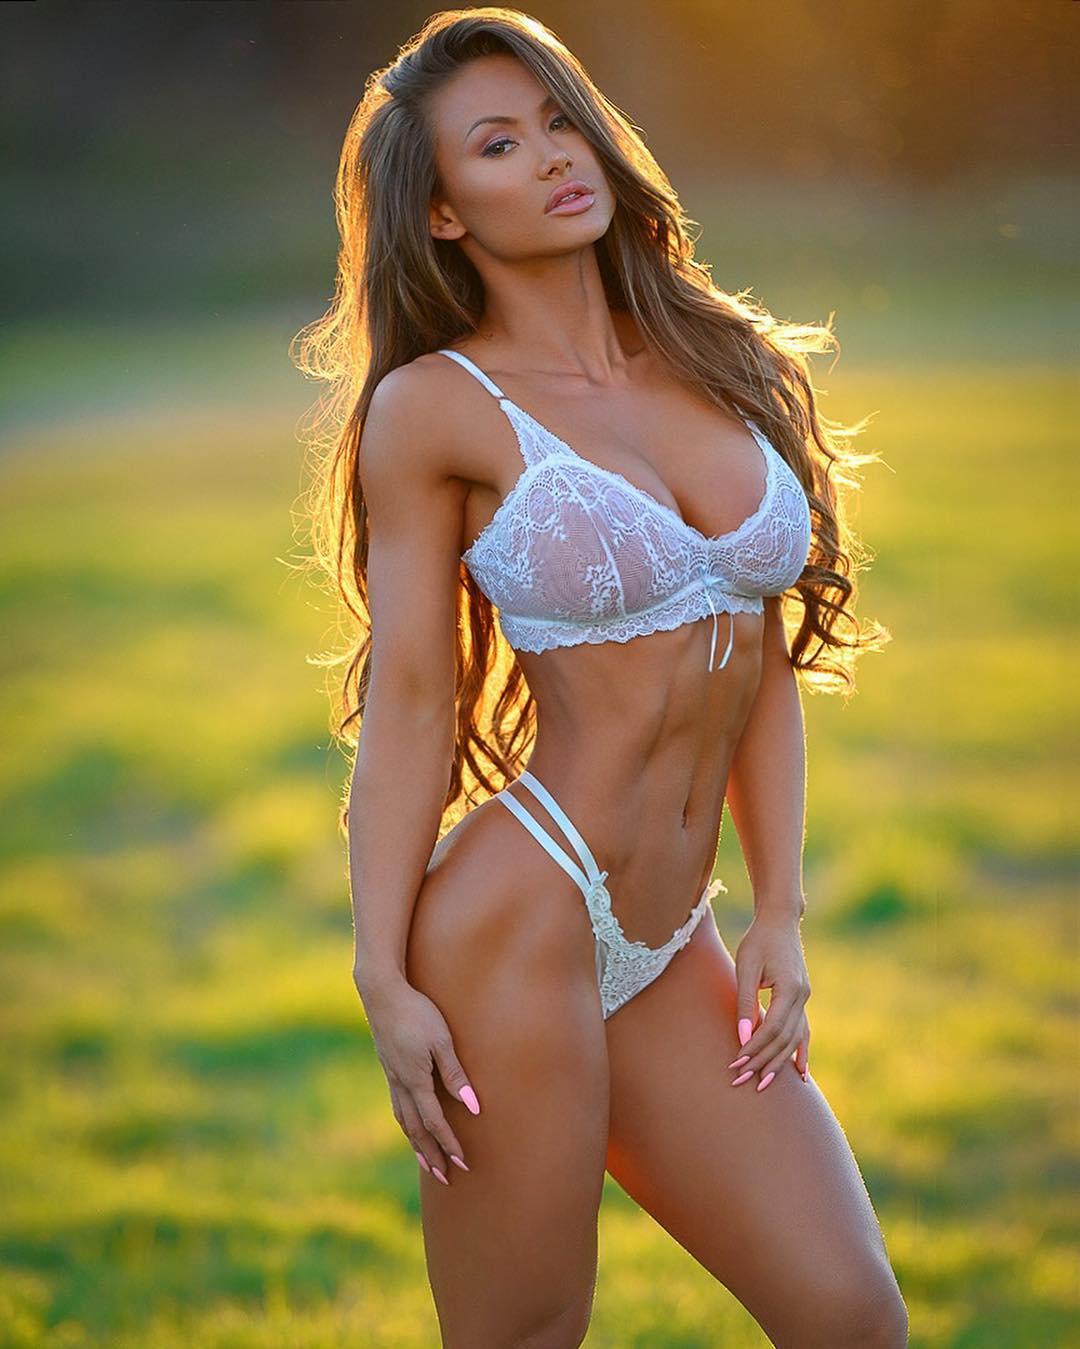 Michie Peachie - Michie-Peachie-22 - Great Muscle Bodies -5803